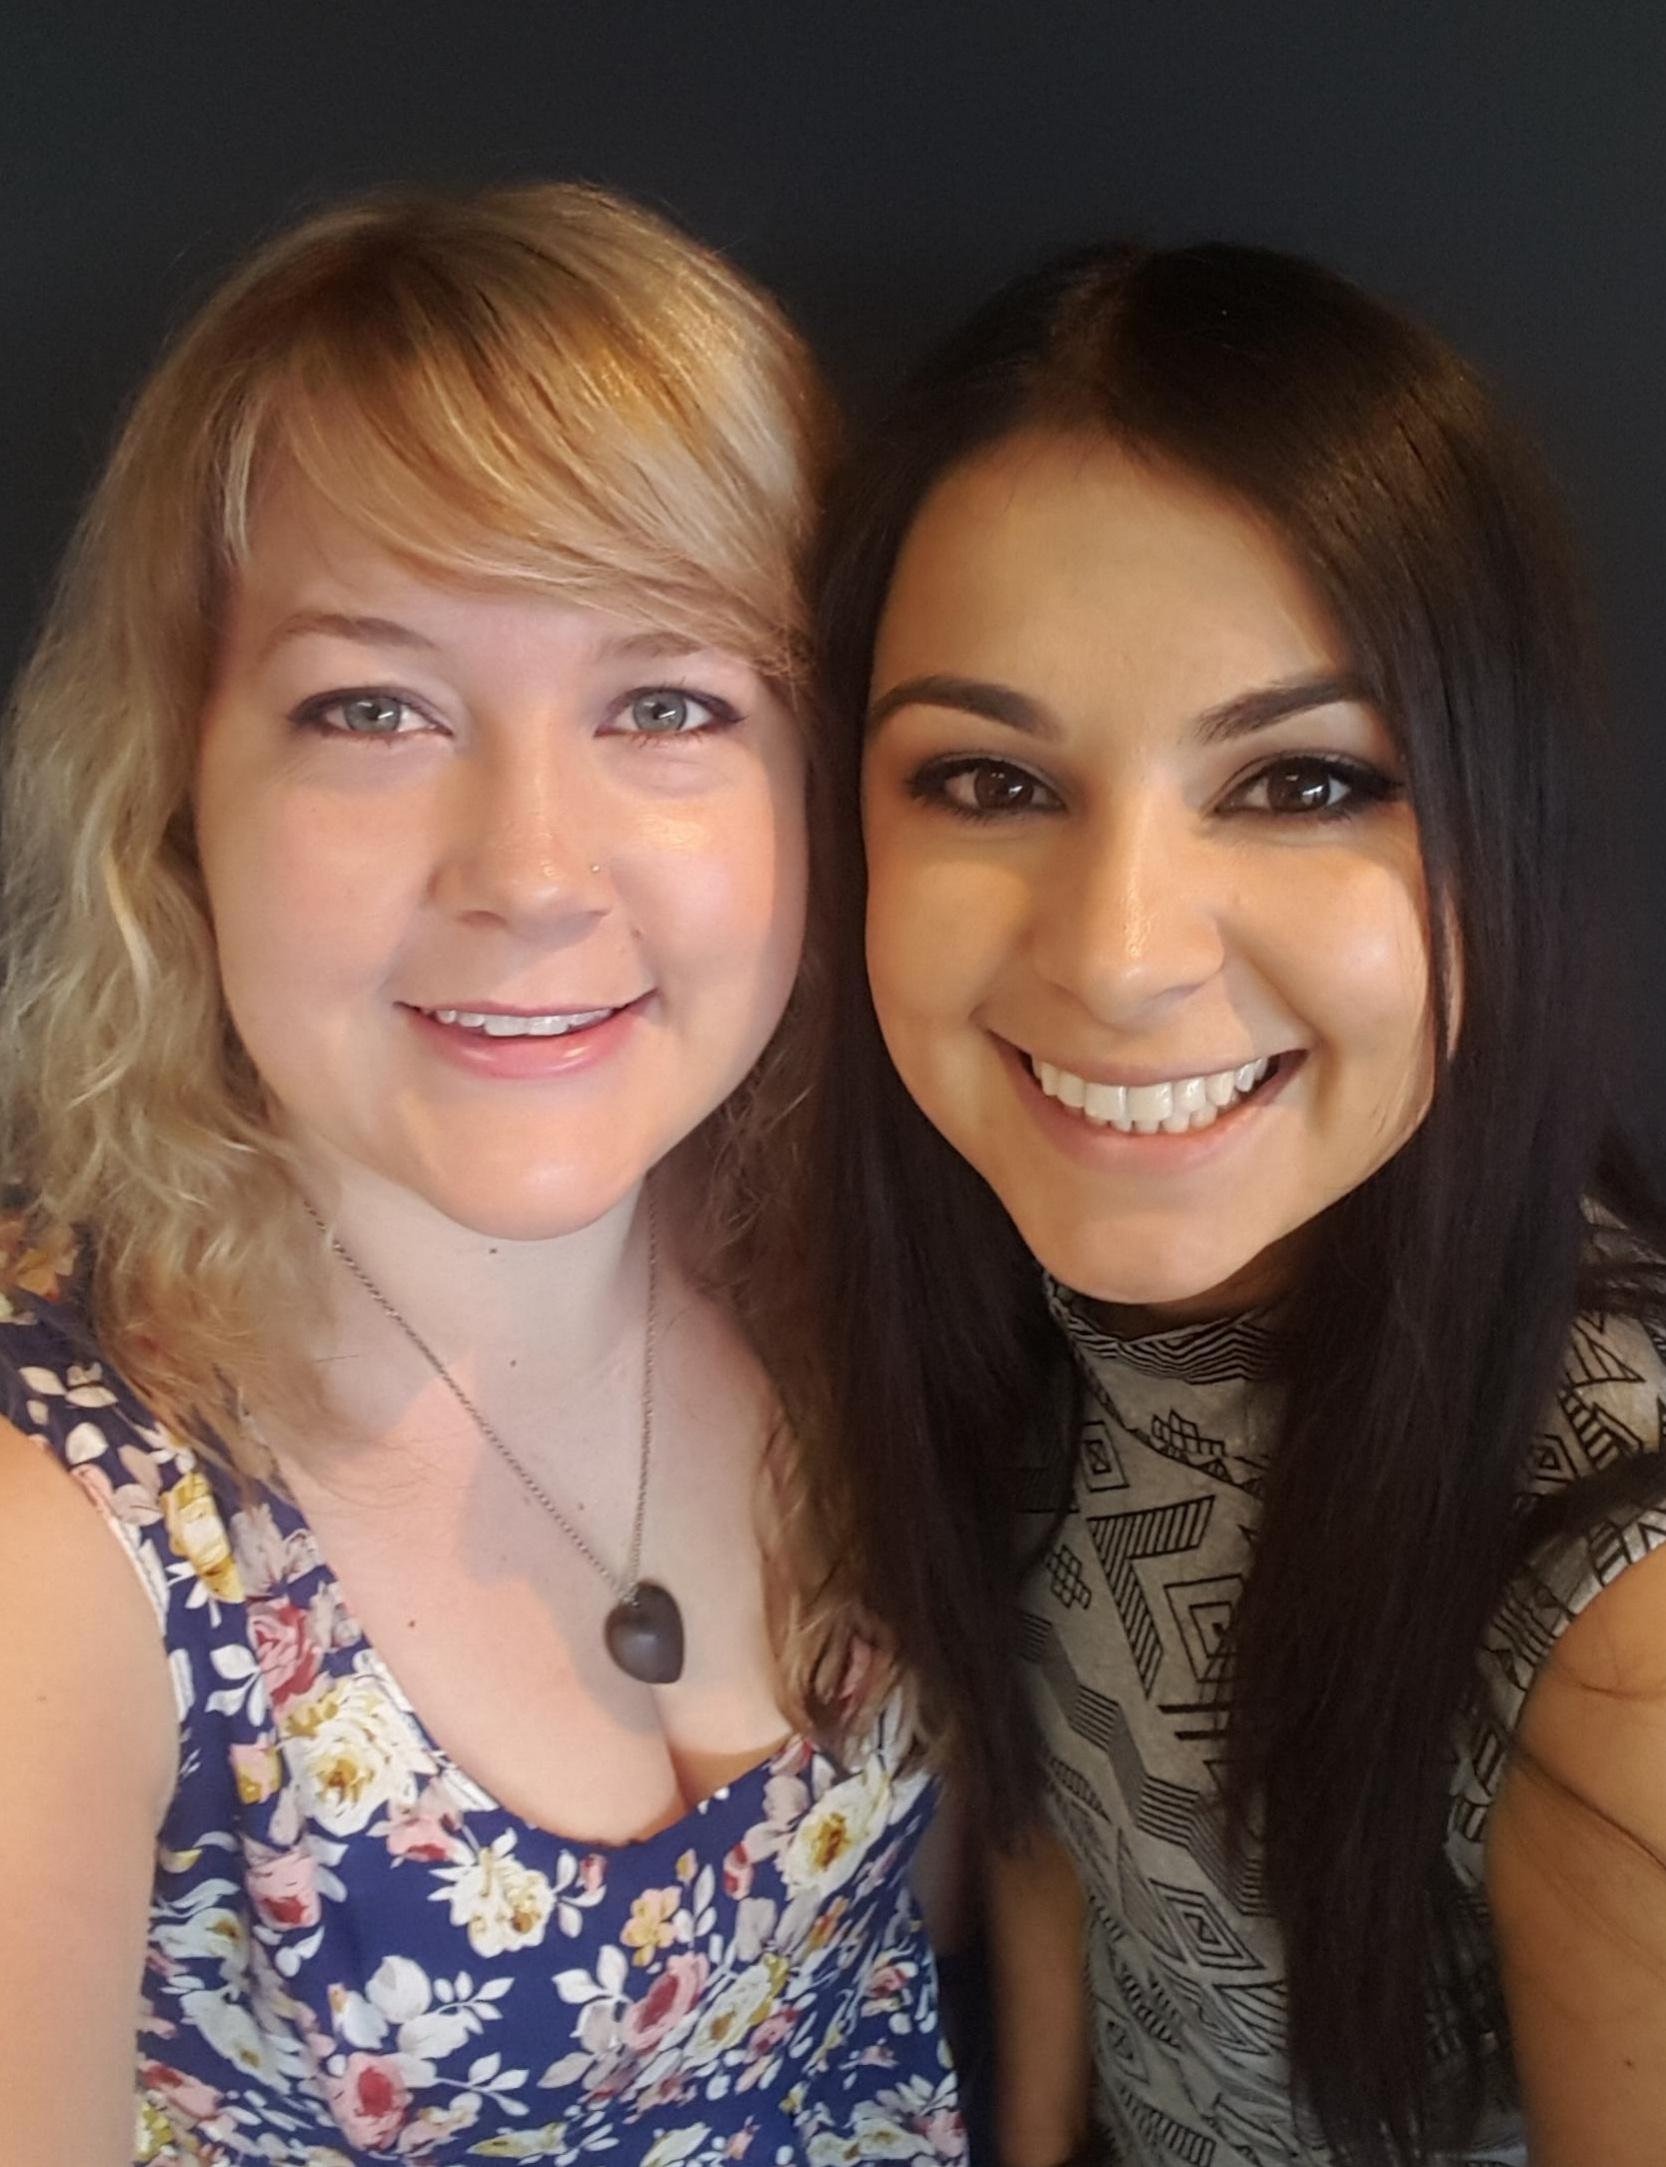 Jennifer Vieira and Samantha Steele